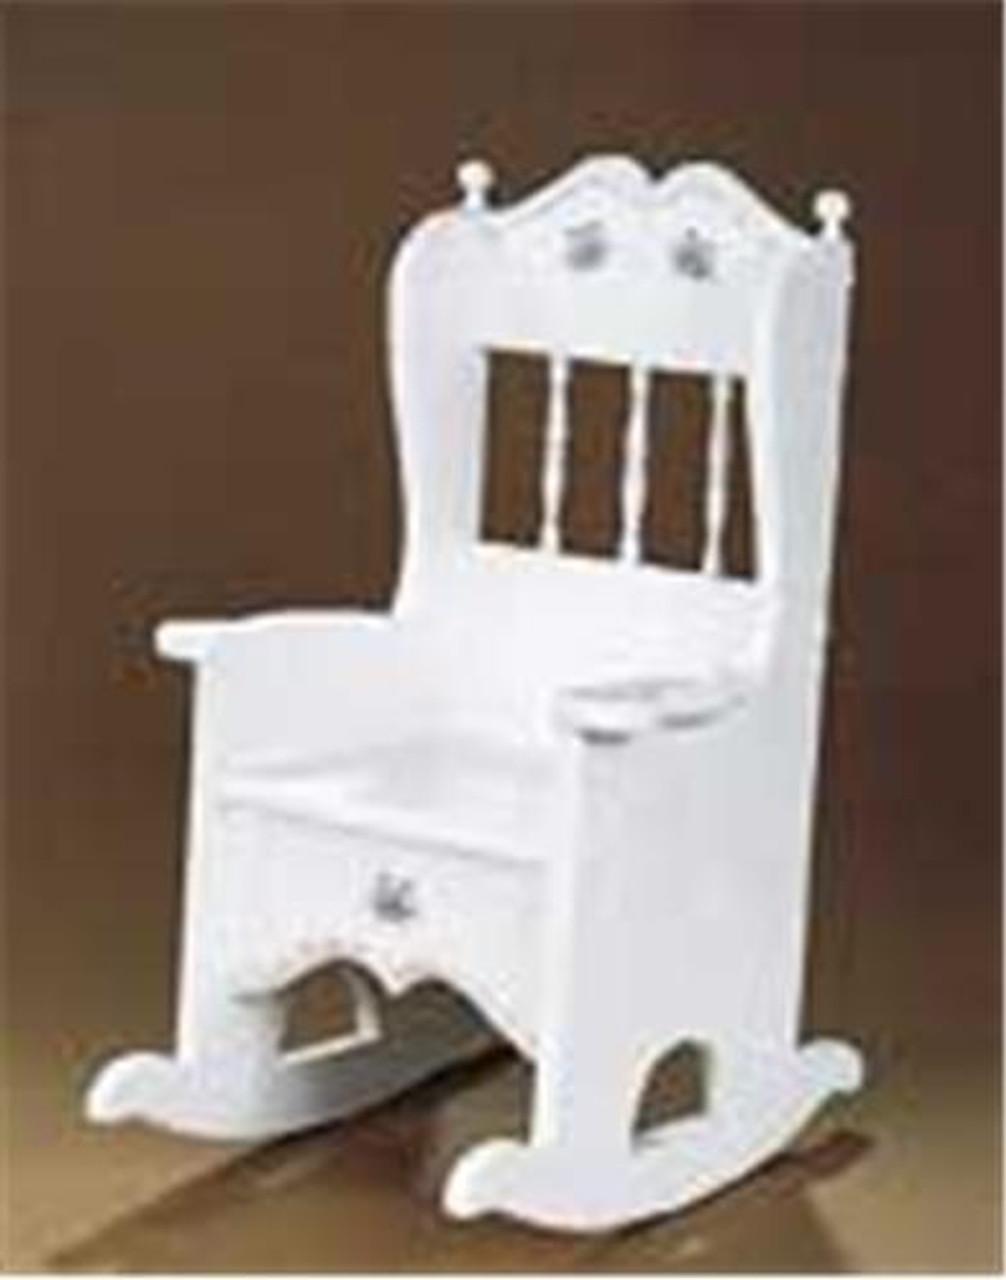 Cherry Tree Toys Rocker Potty Chair Plan